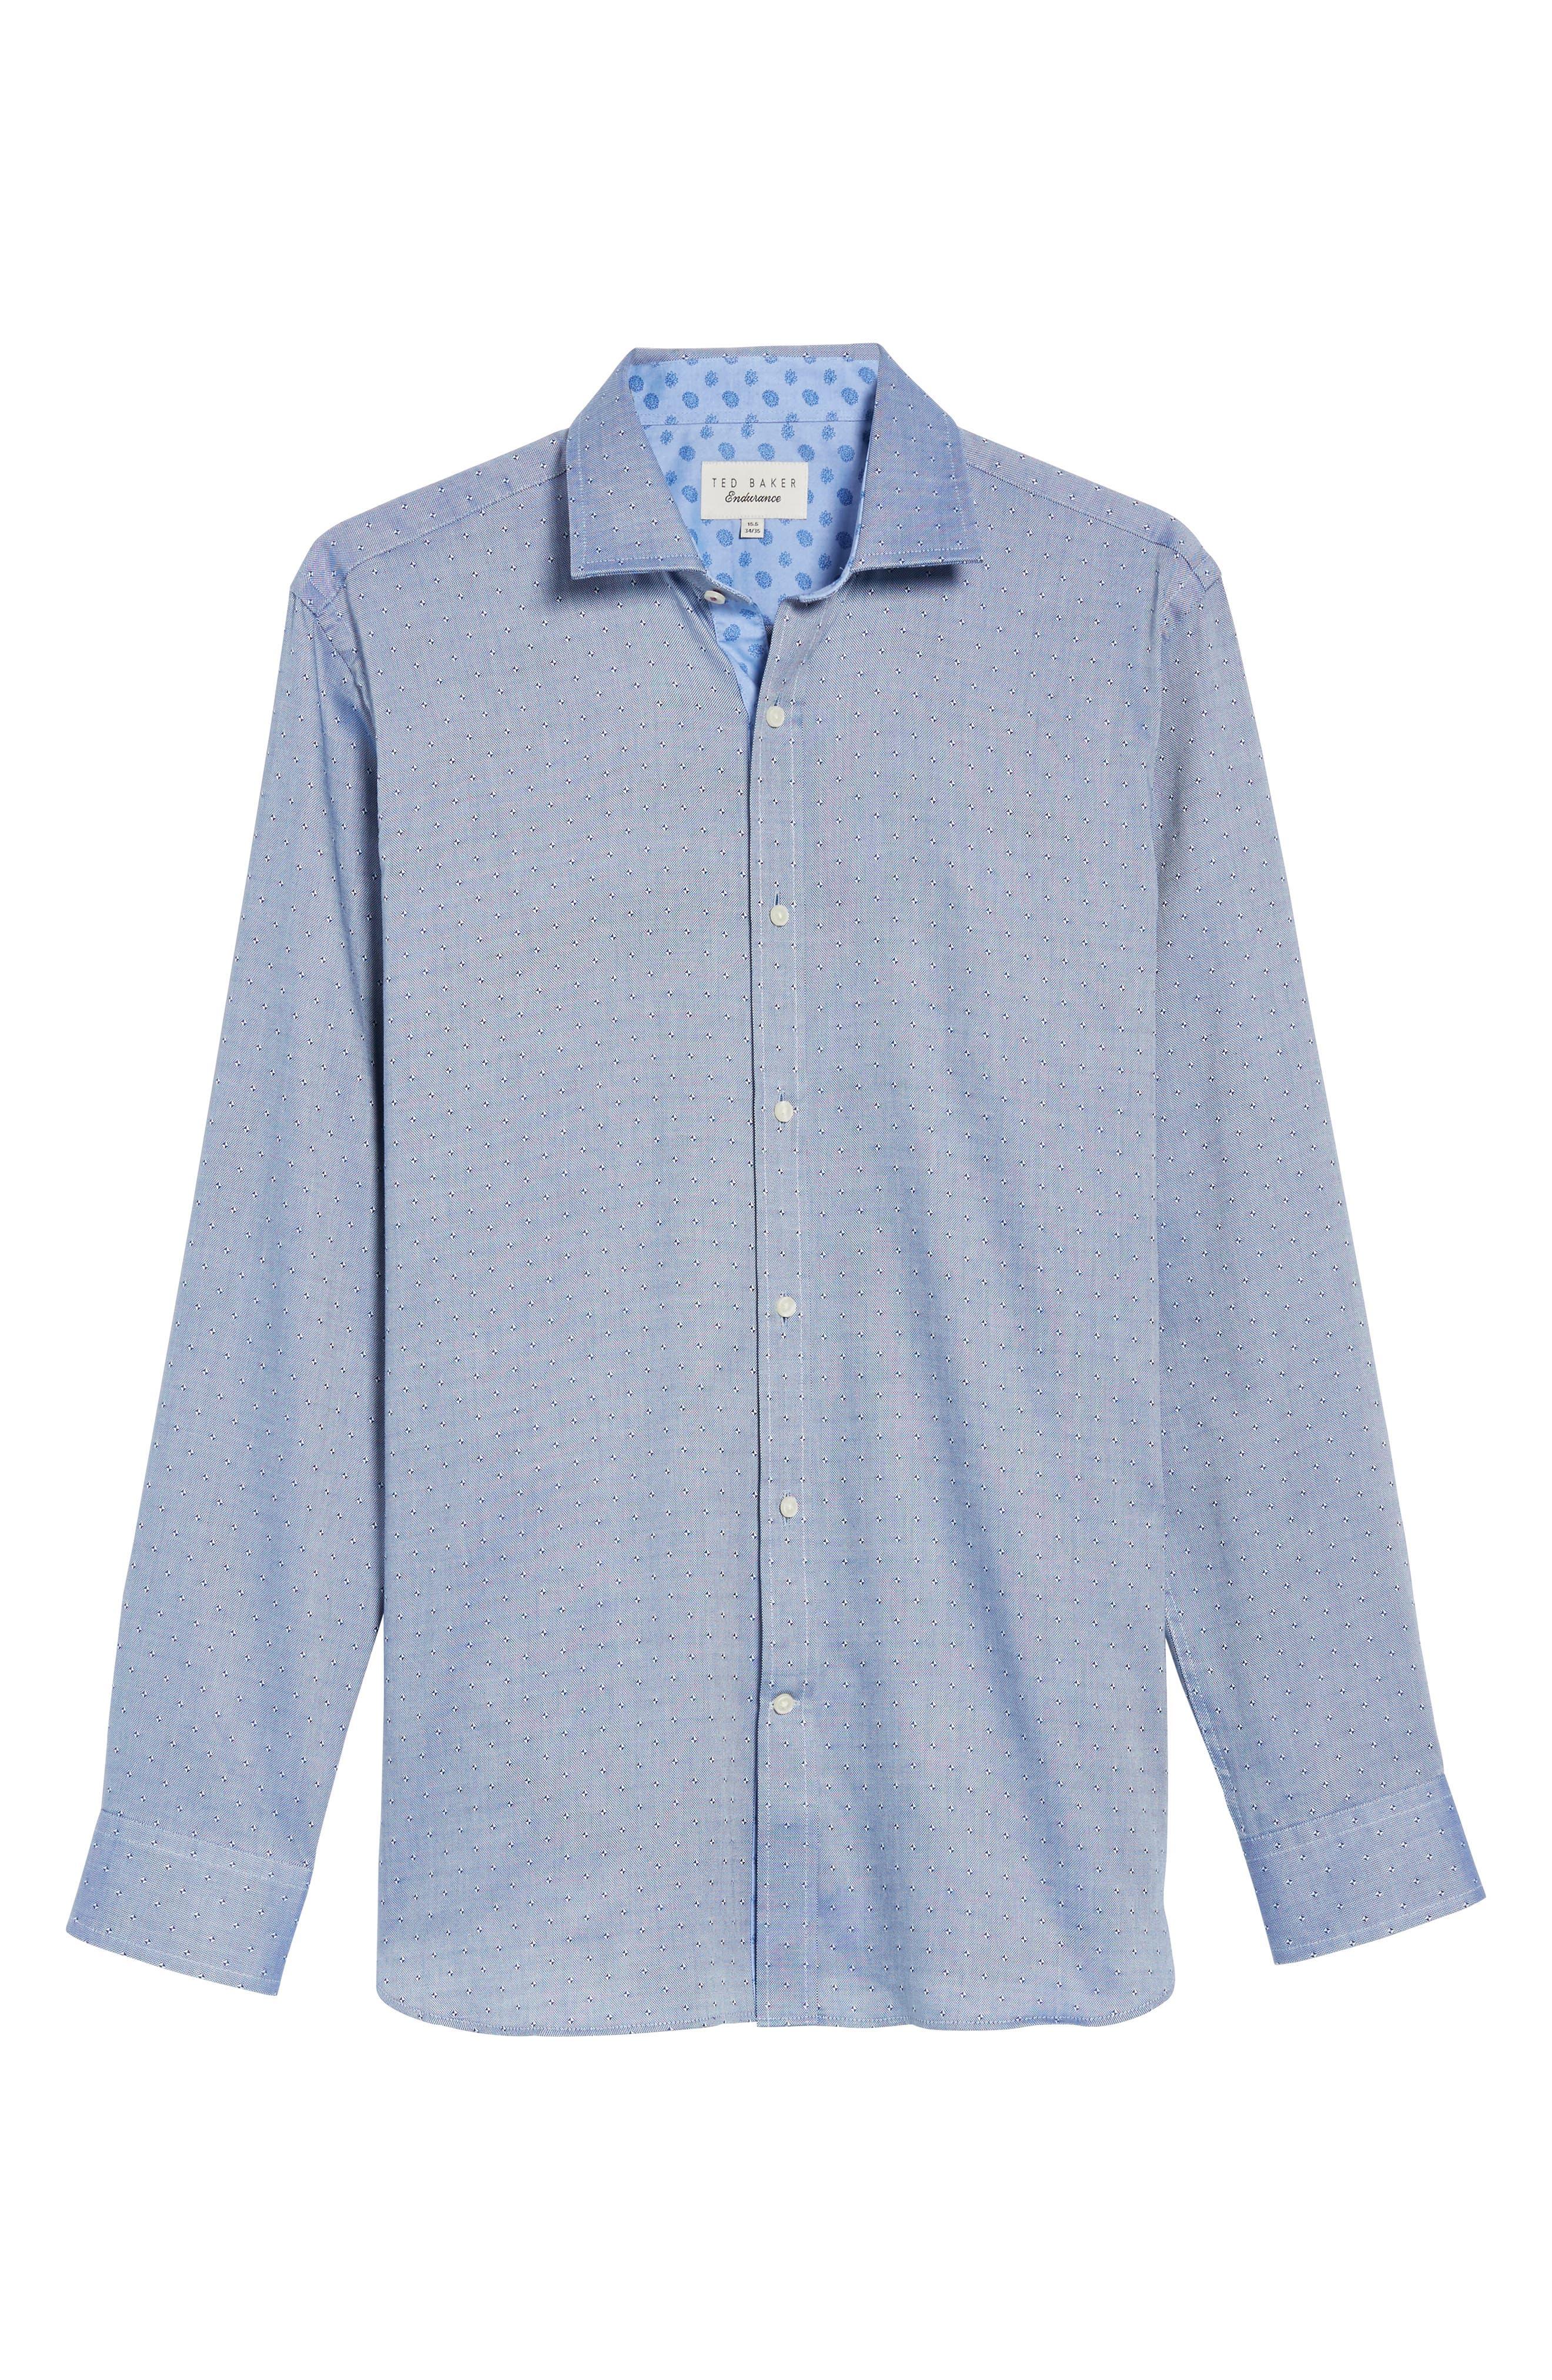 Jamer Trim Fit Dot Dress Shirt,                             Alternate thumbnail 5, color,                             Navy